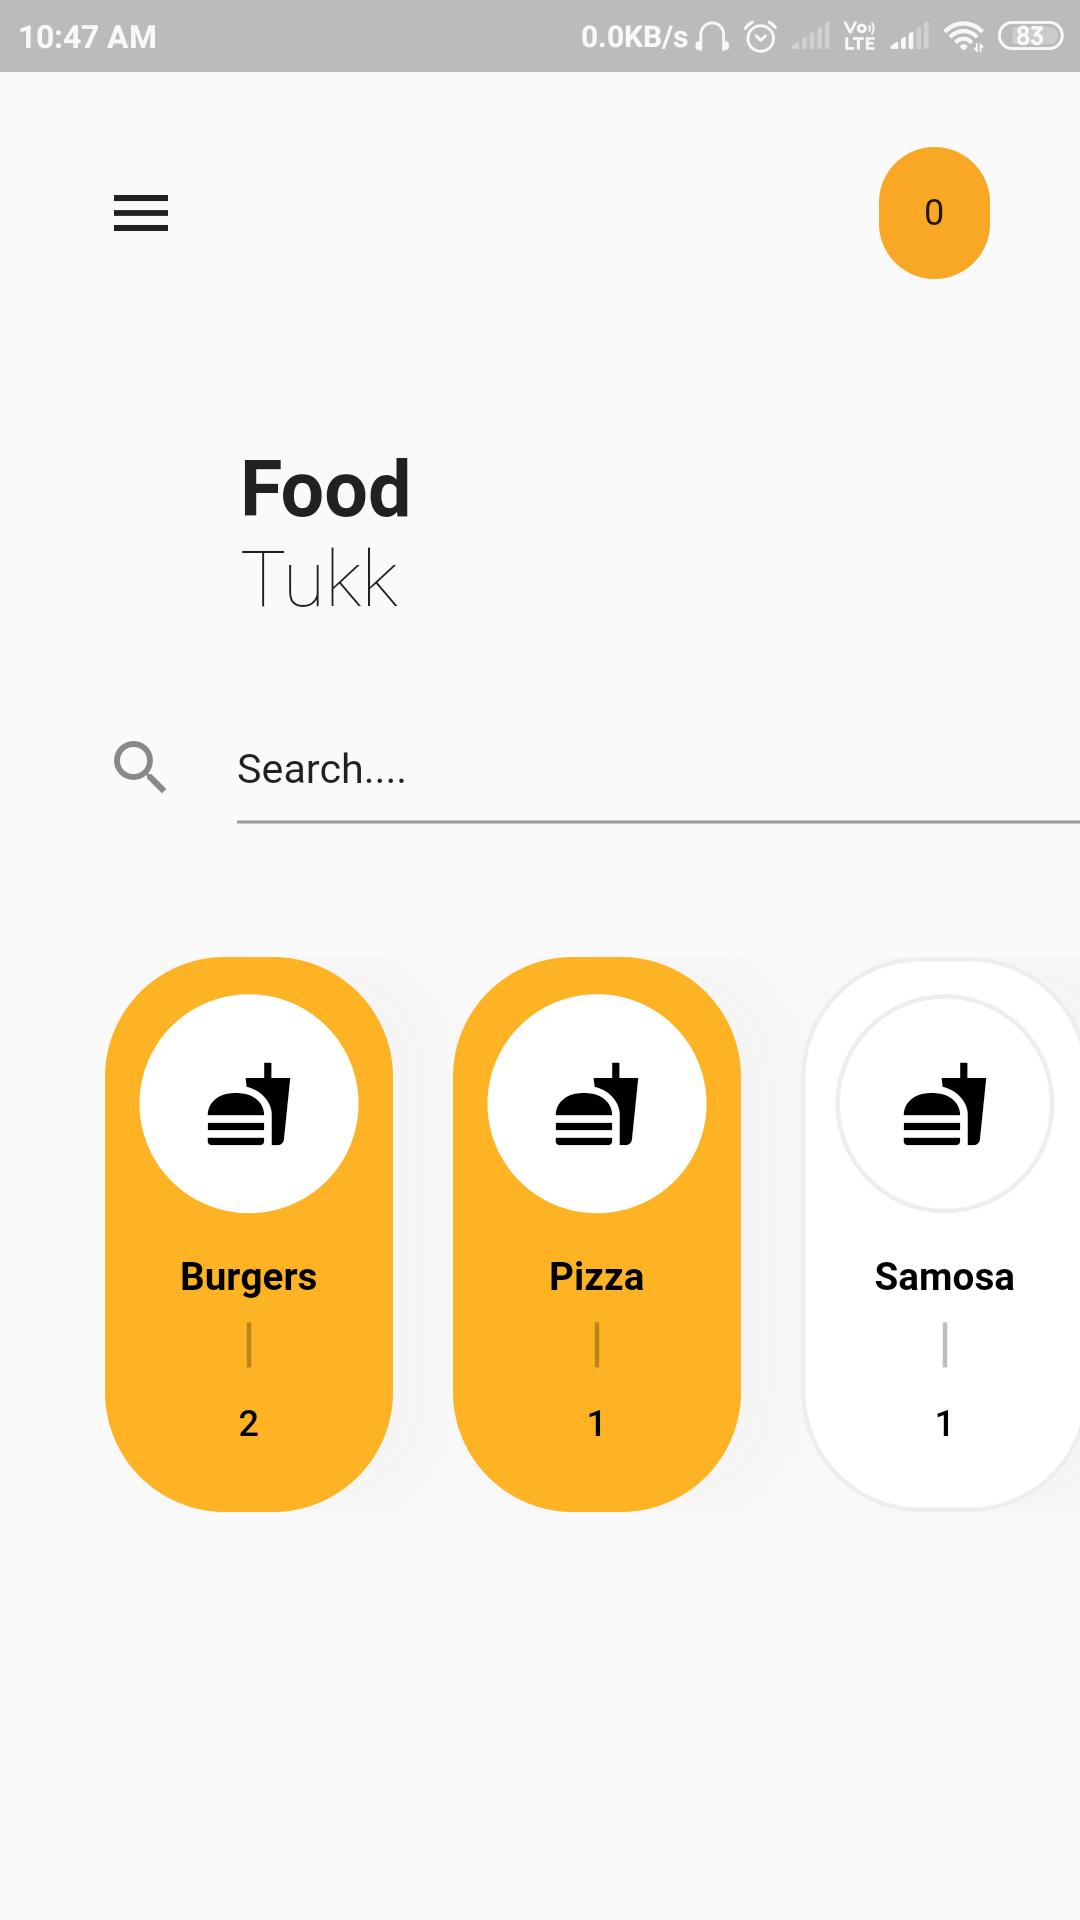 Screenshot_2019-10-16-10-47-09-757_com example food_delivery